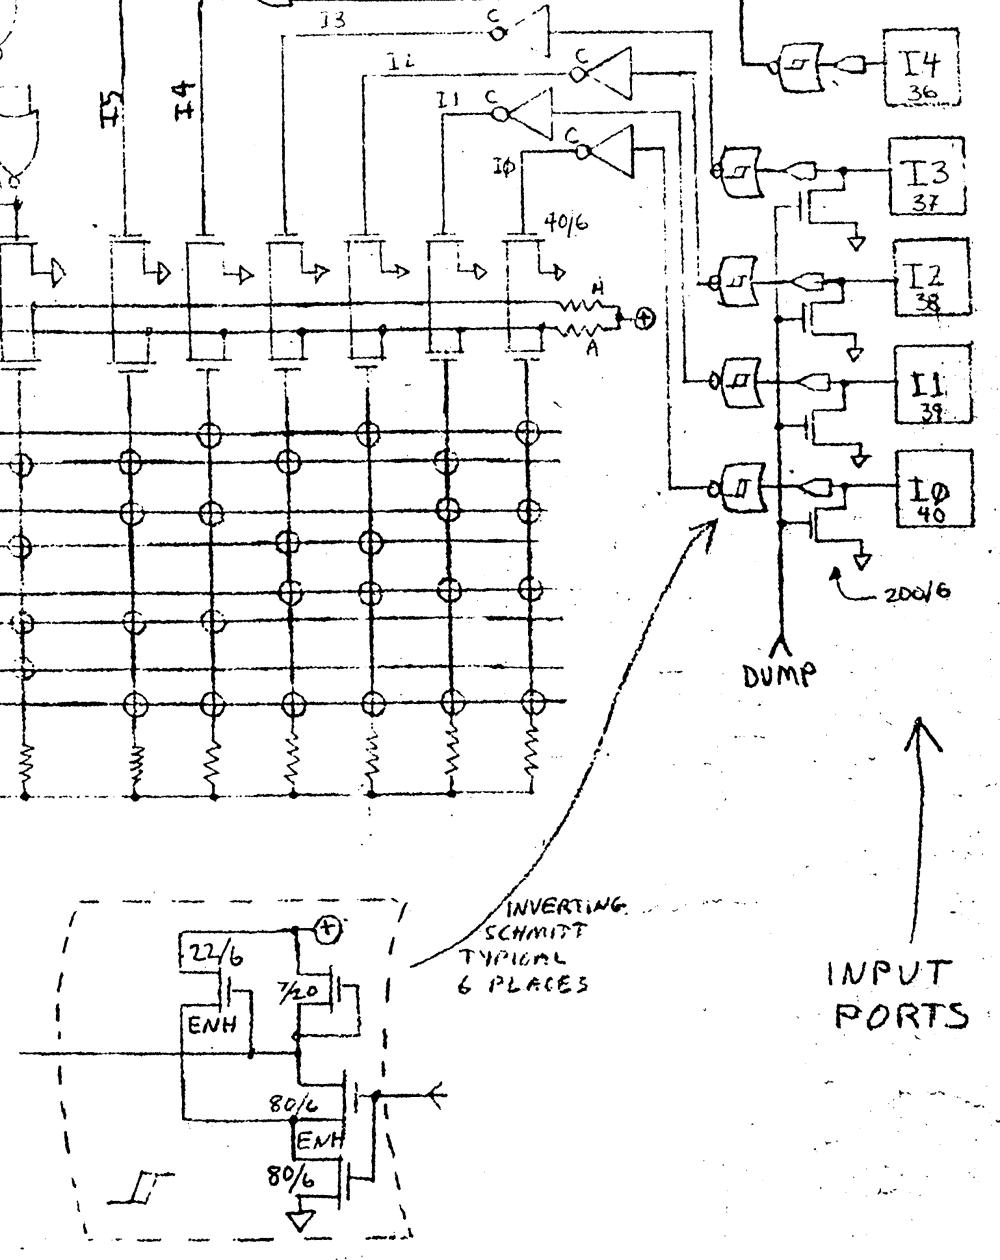 medium resolution of vectrex controller to atari 2600 adapter cnk rtd wiring diagram vectrex controller wiring diagram